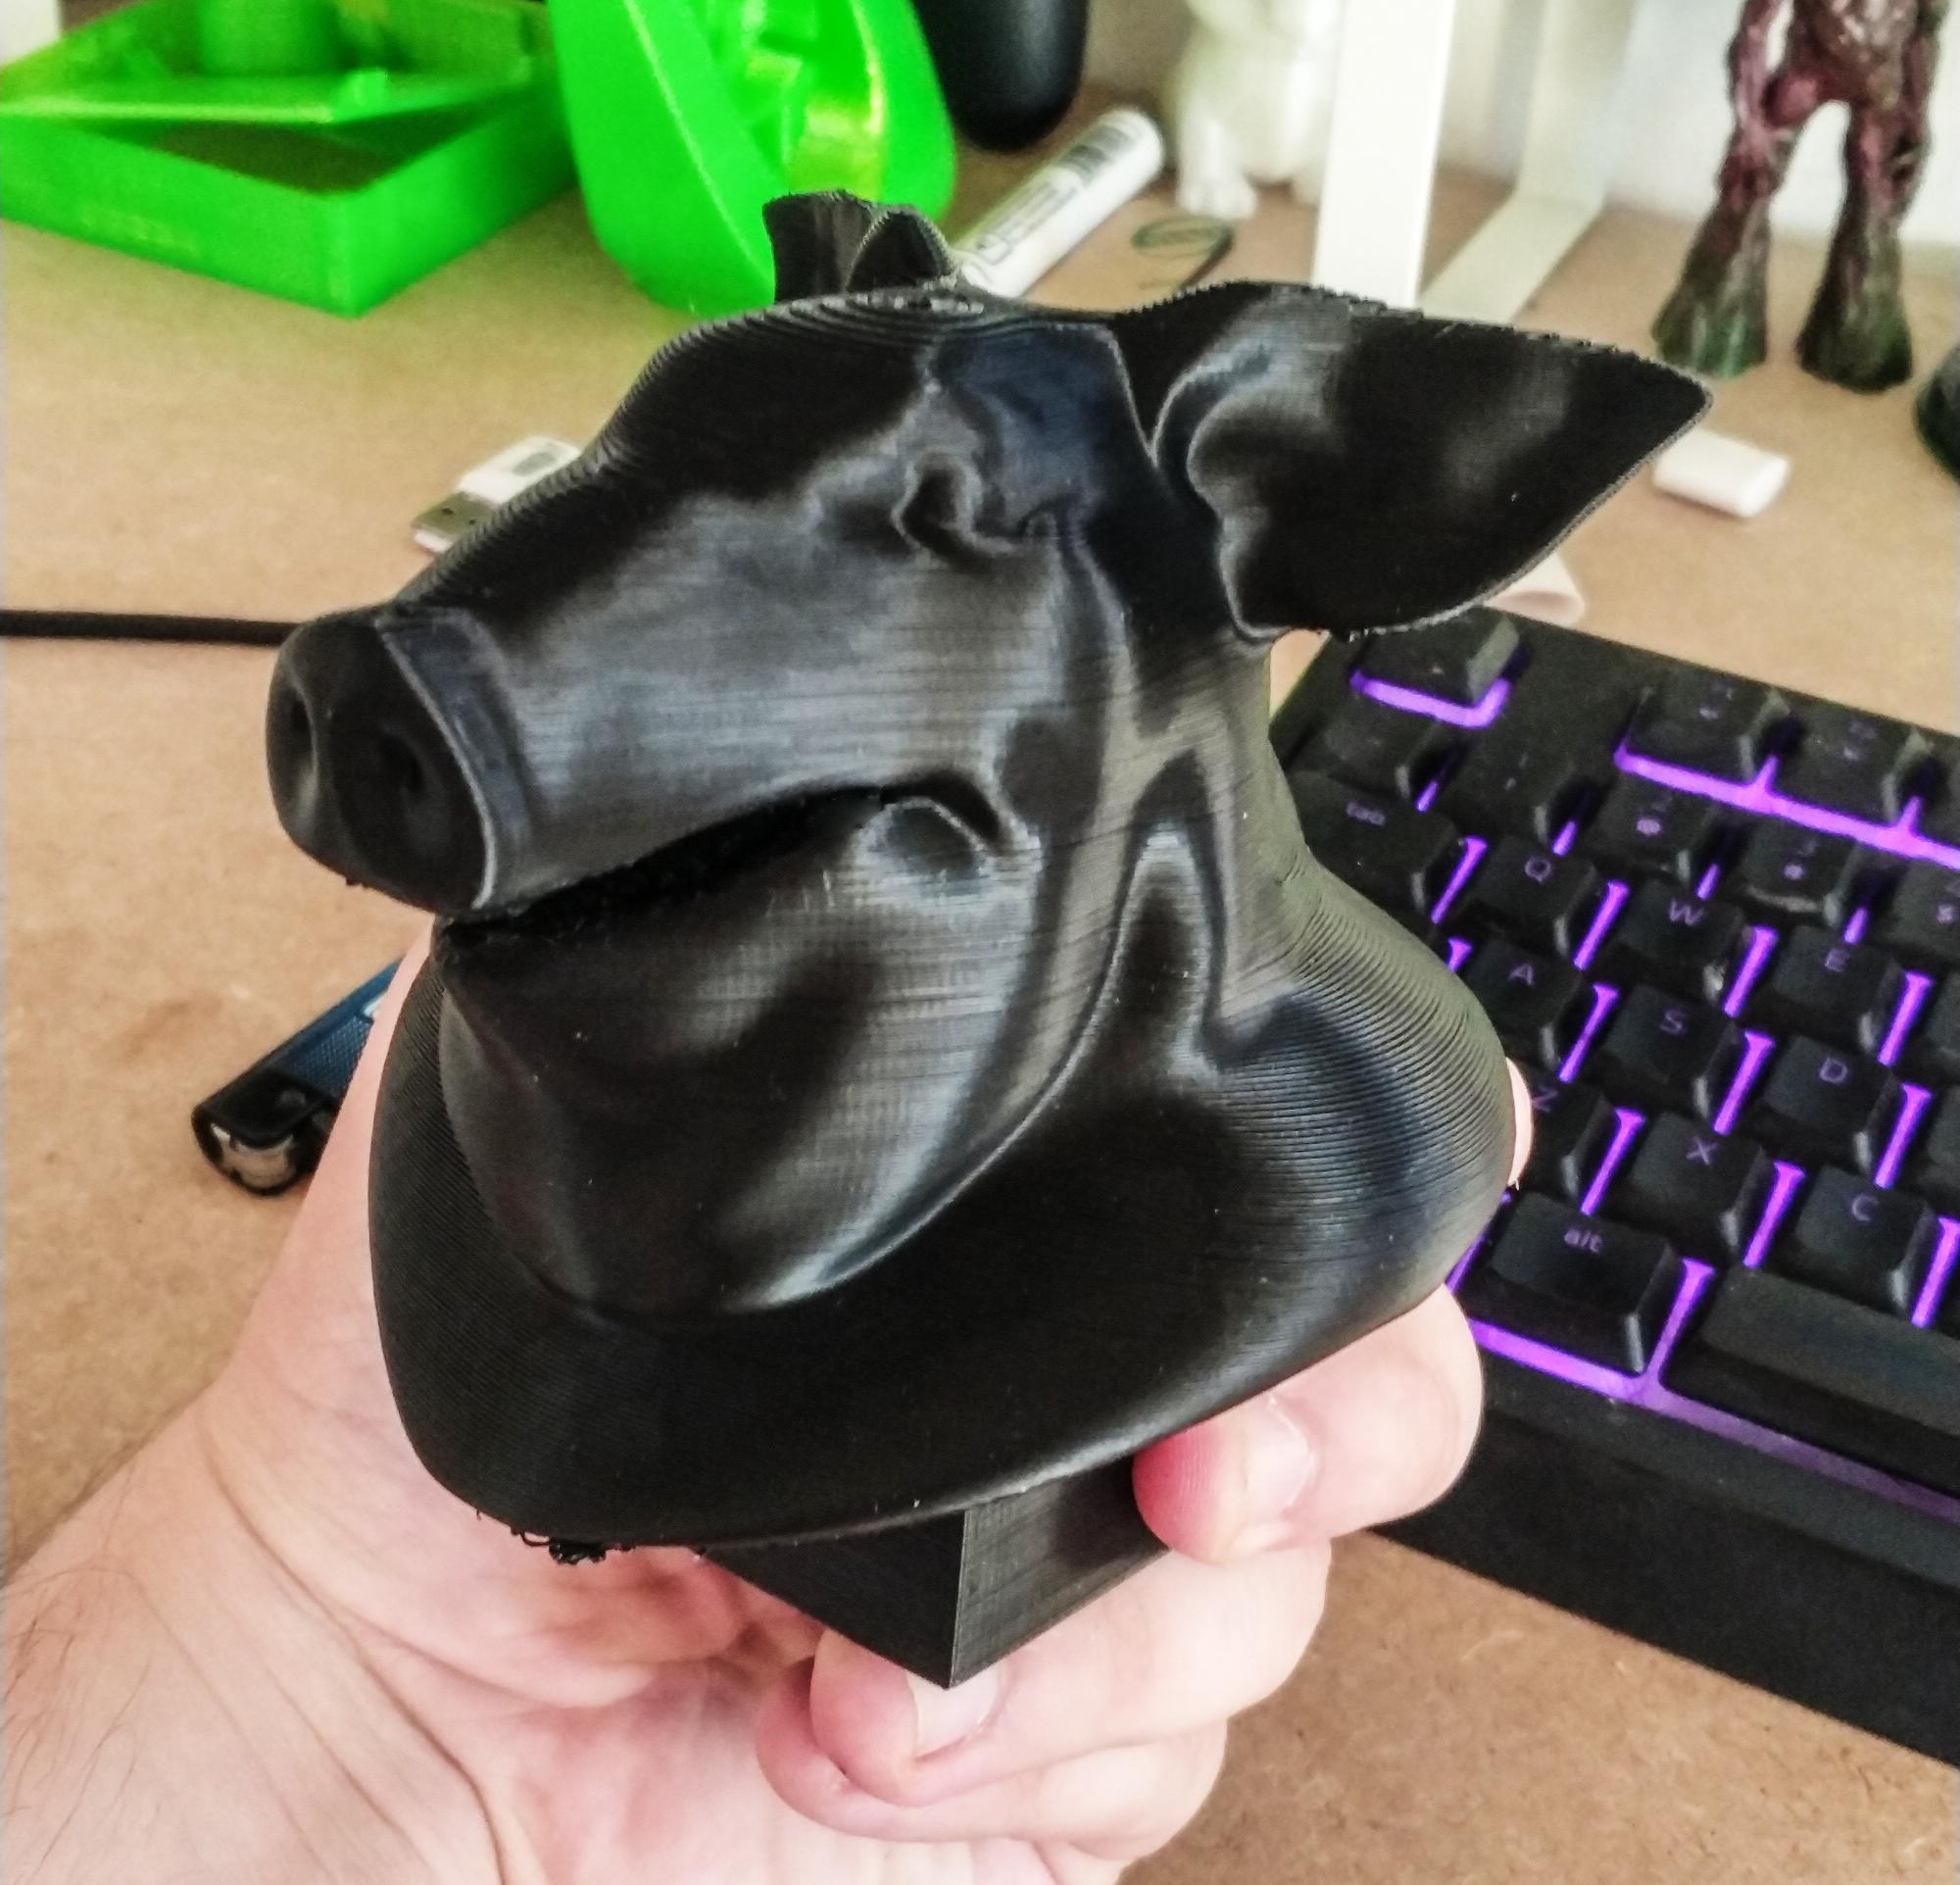 Test Geometry Pig Head SideFX